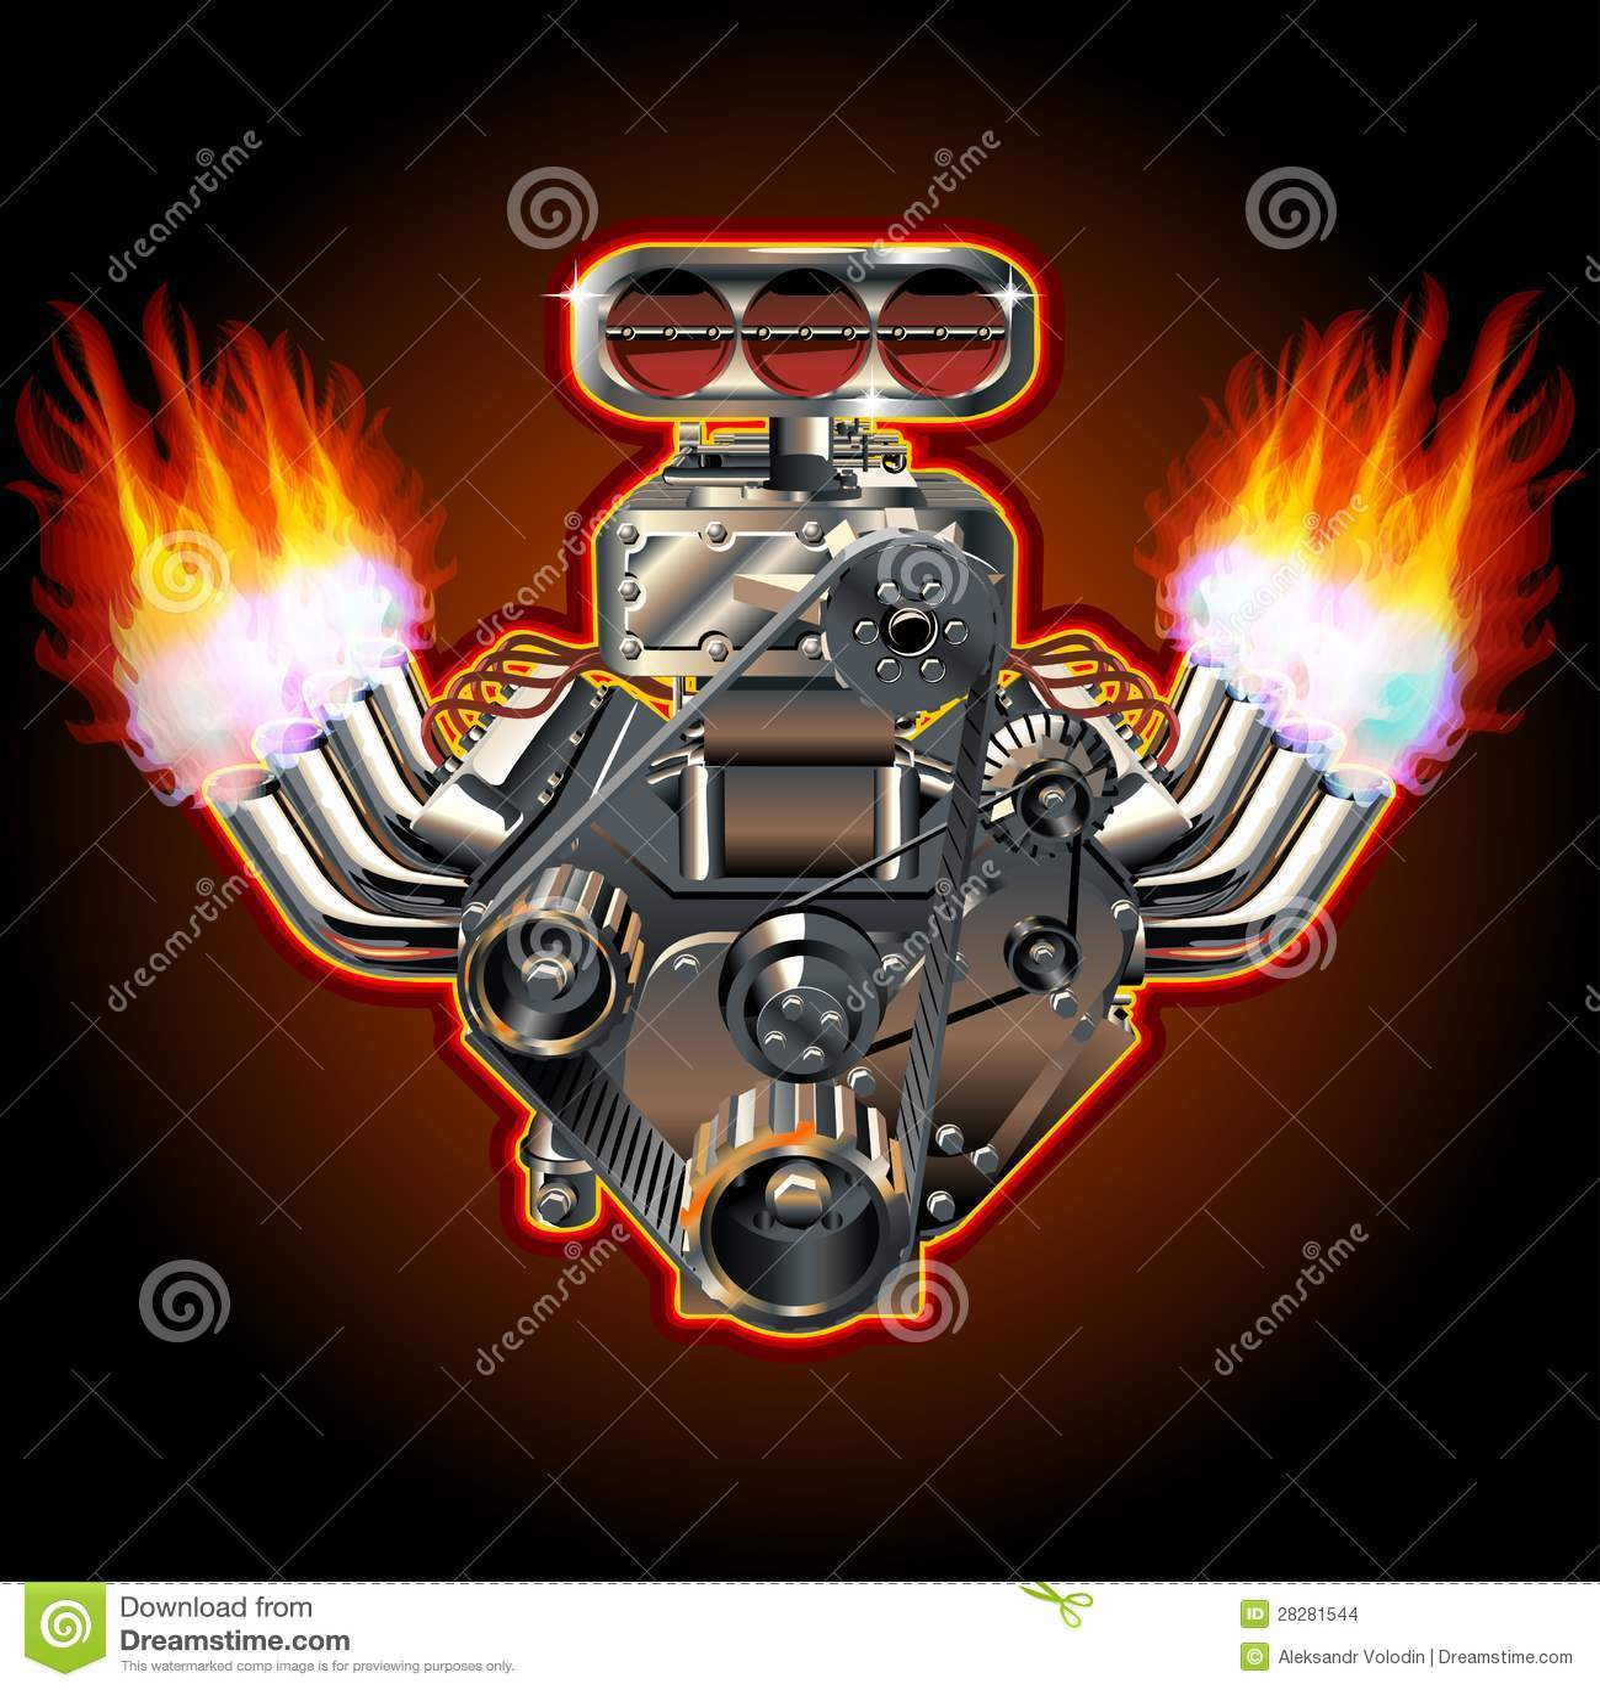 Vector Cartoon Turbo Engine Stock Images - Image: 28281544